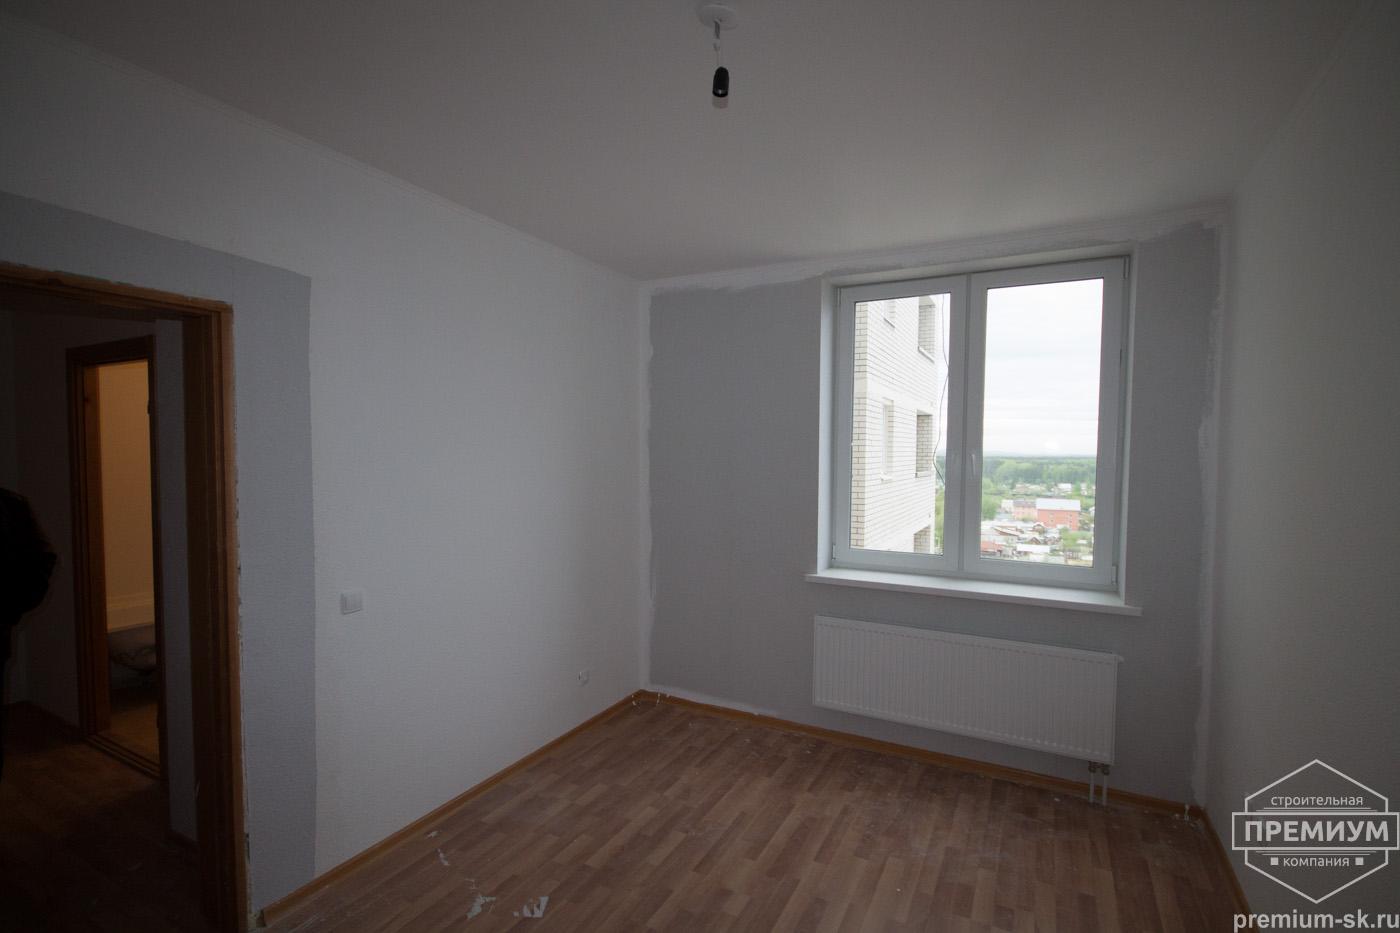 Ремонт квартир под ключ в Нижнем Новгороде - Нижний